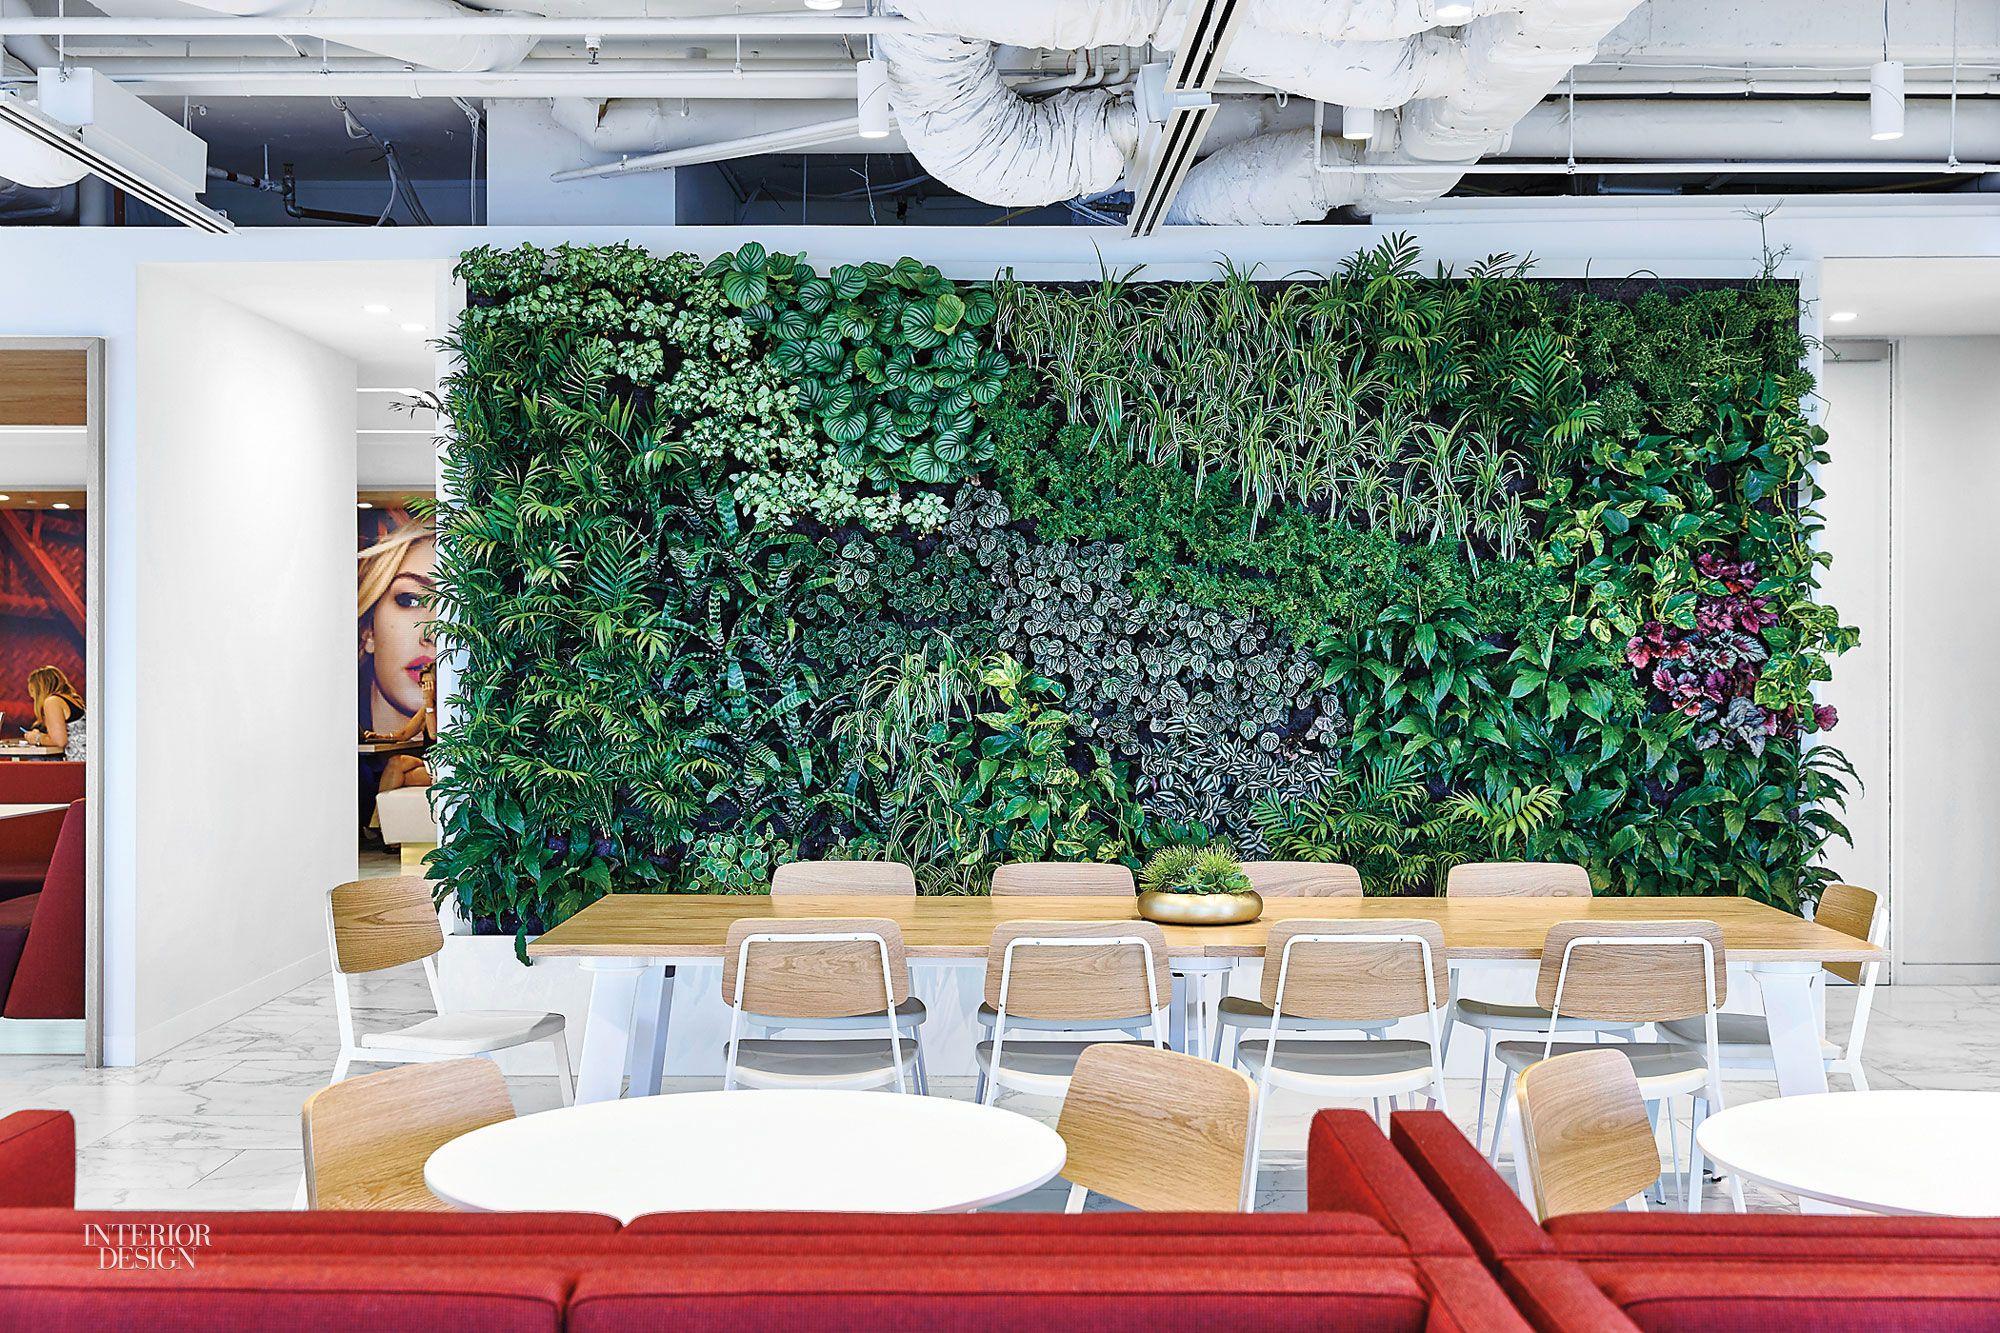 5 Bold Fashion And Beauty Offices Vertical Garden Interior Architecture Design Design